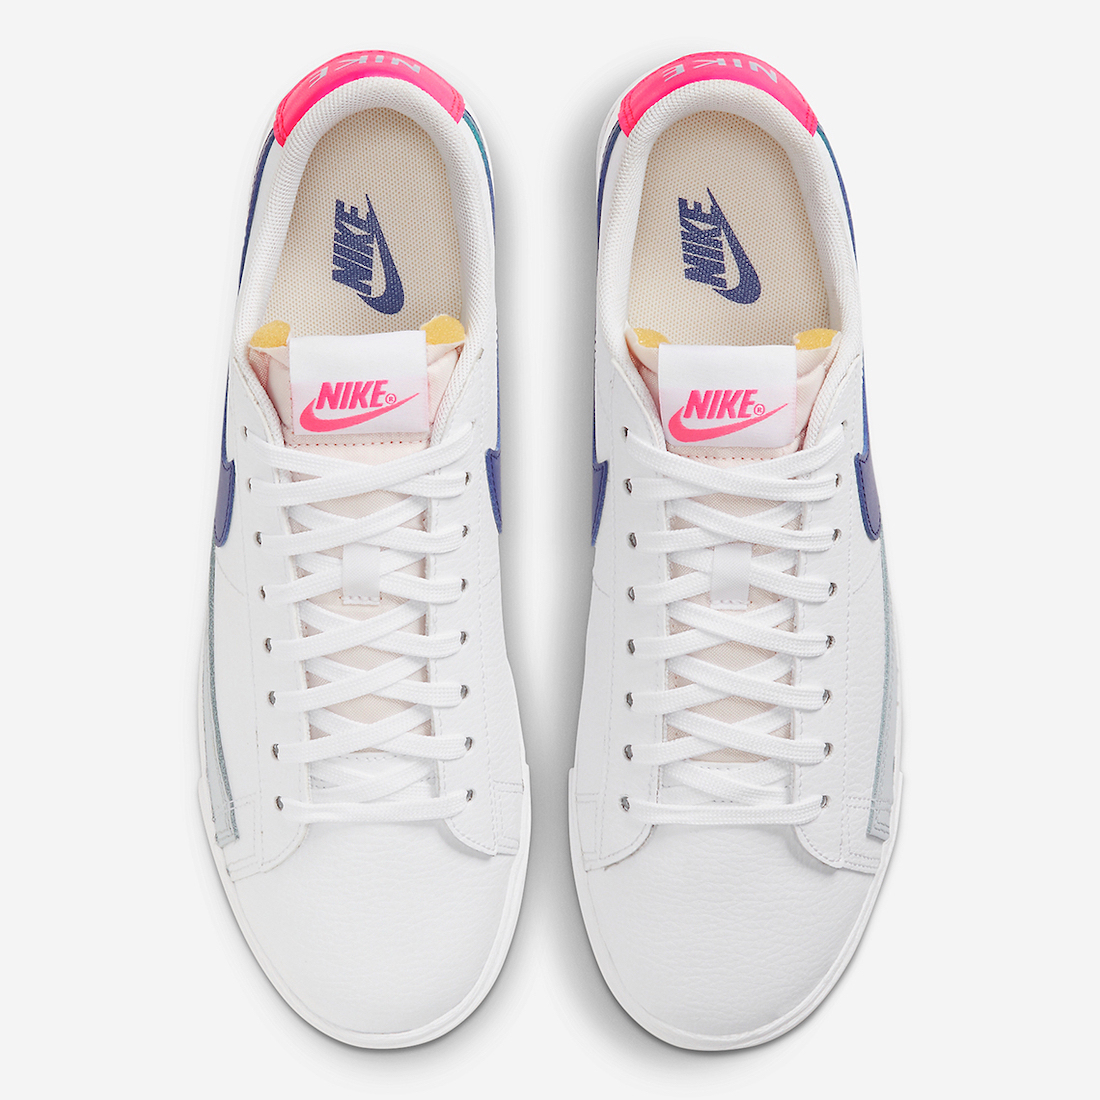 Nike Blazer Low Hyper Pink Concord DC9211-100 Release Date Info